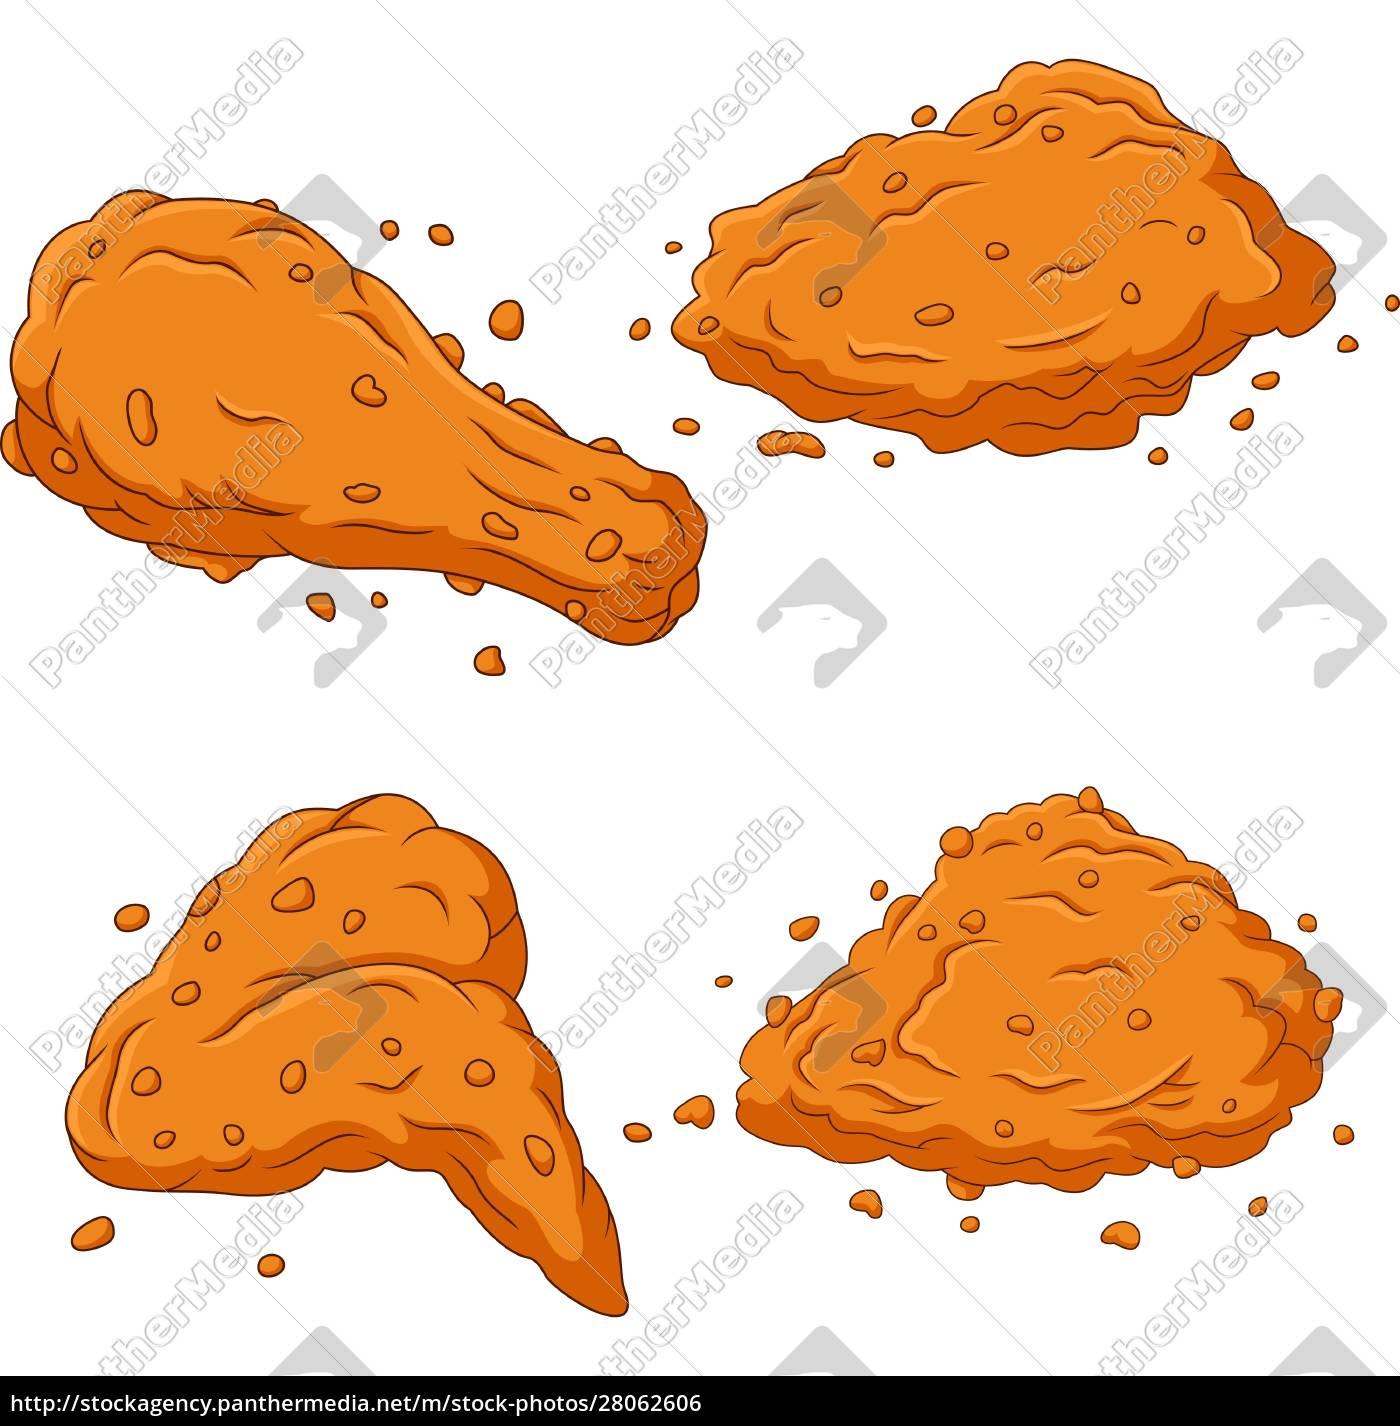 cartoon, fried, chicken, collection, set - 28062606